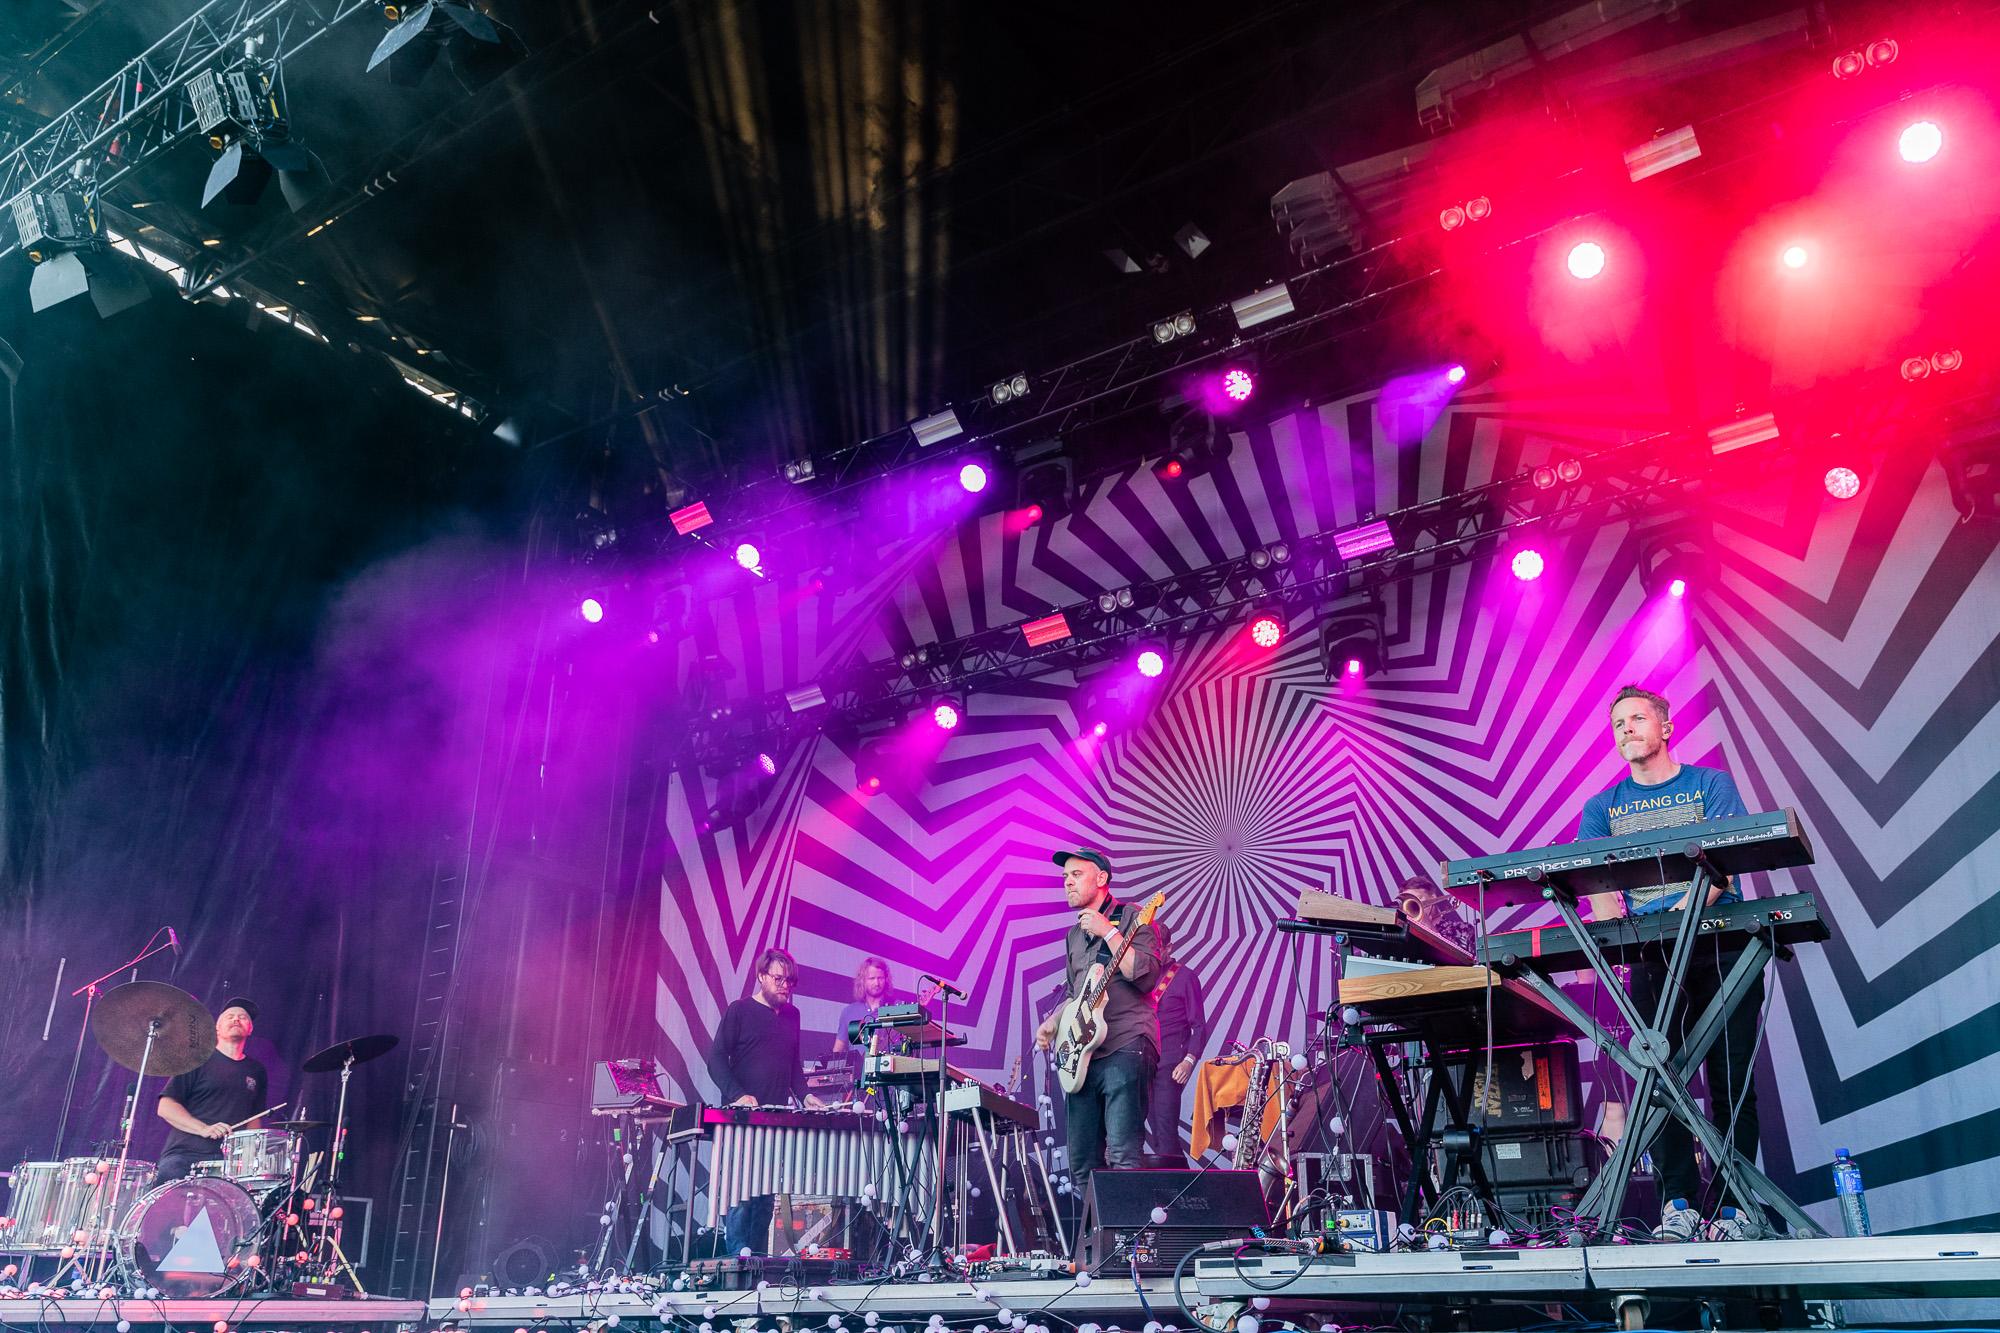 Jaga Jazzist @ Øya presenterer 2021